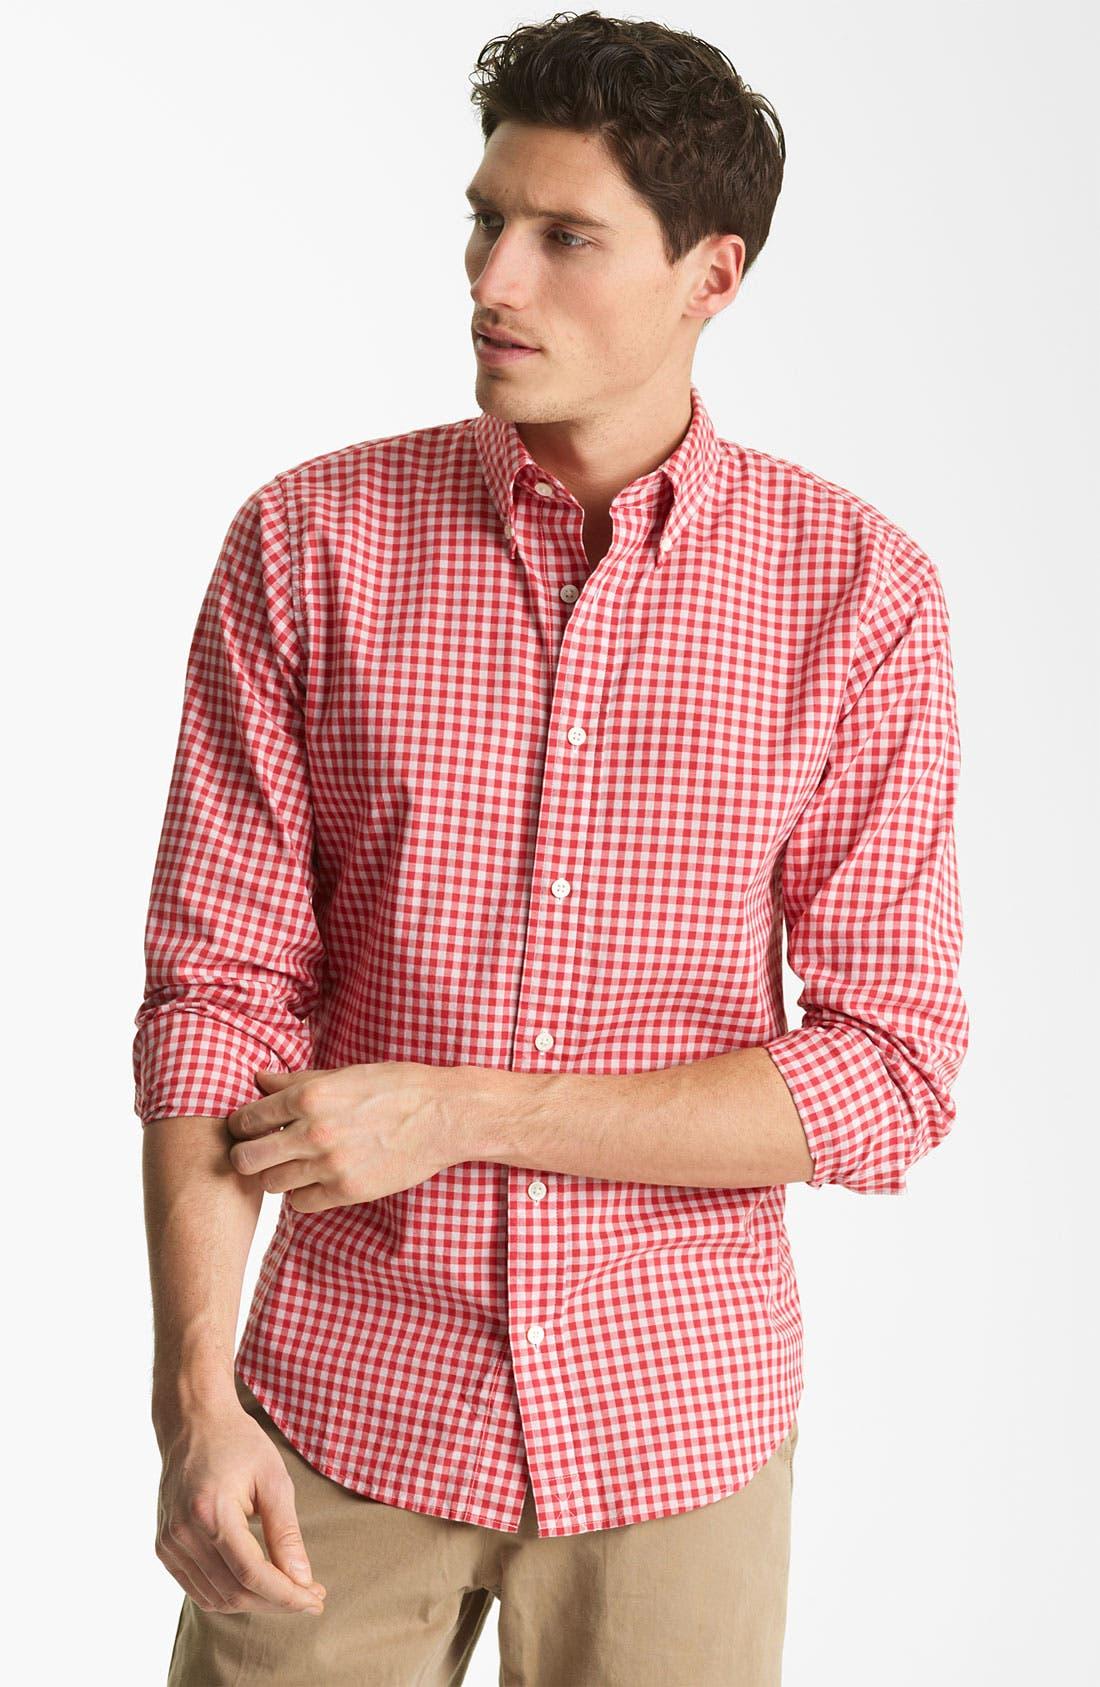 Alternate Image 1 Selected - Jack Spade 'Kern' Gingham Sport Shirt